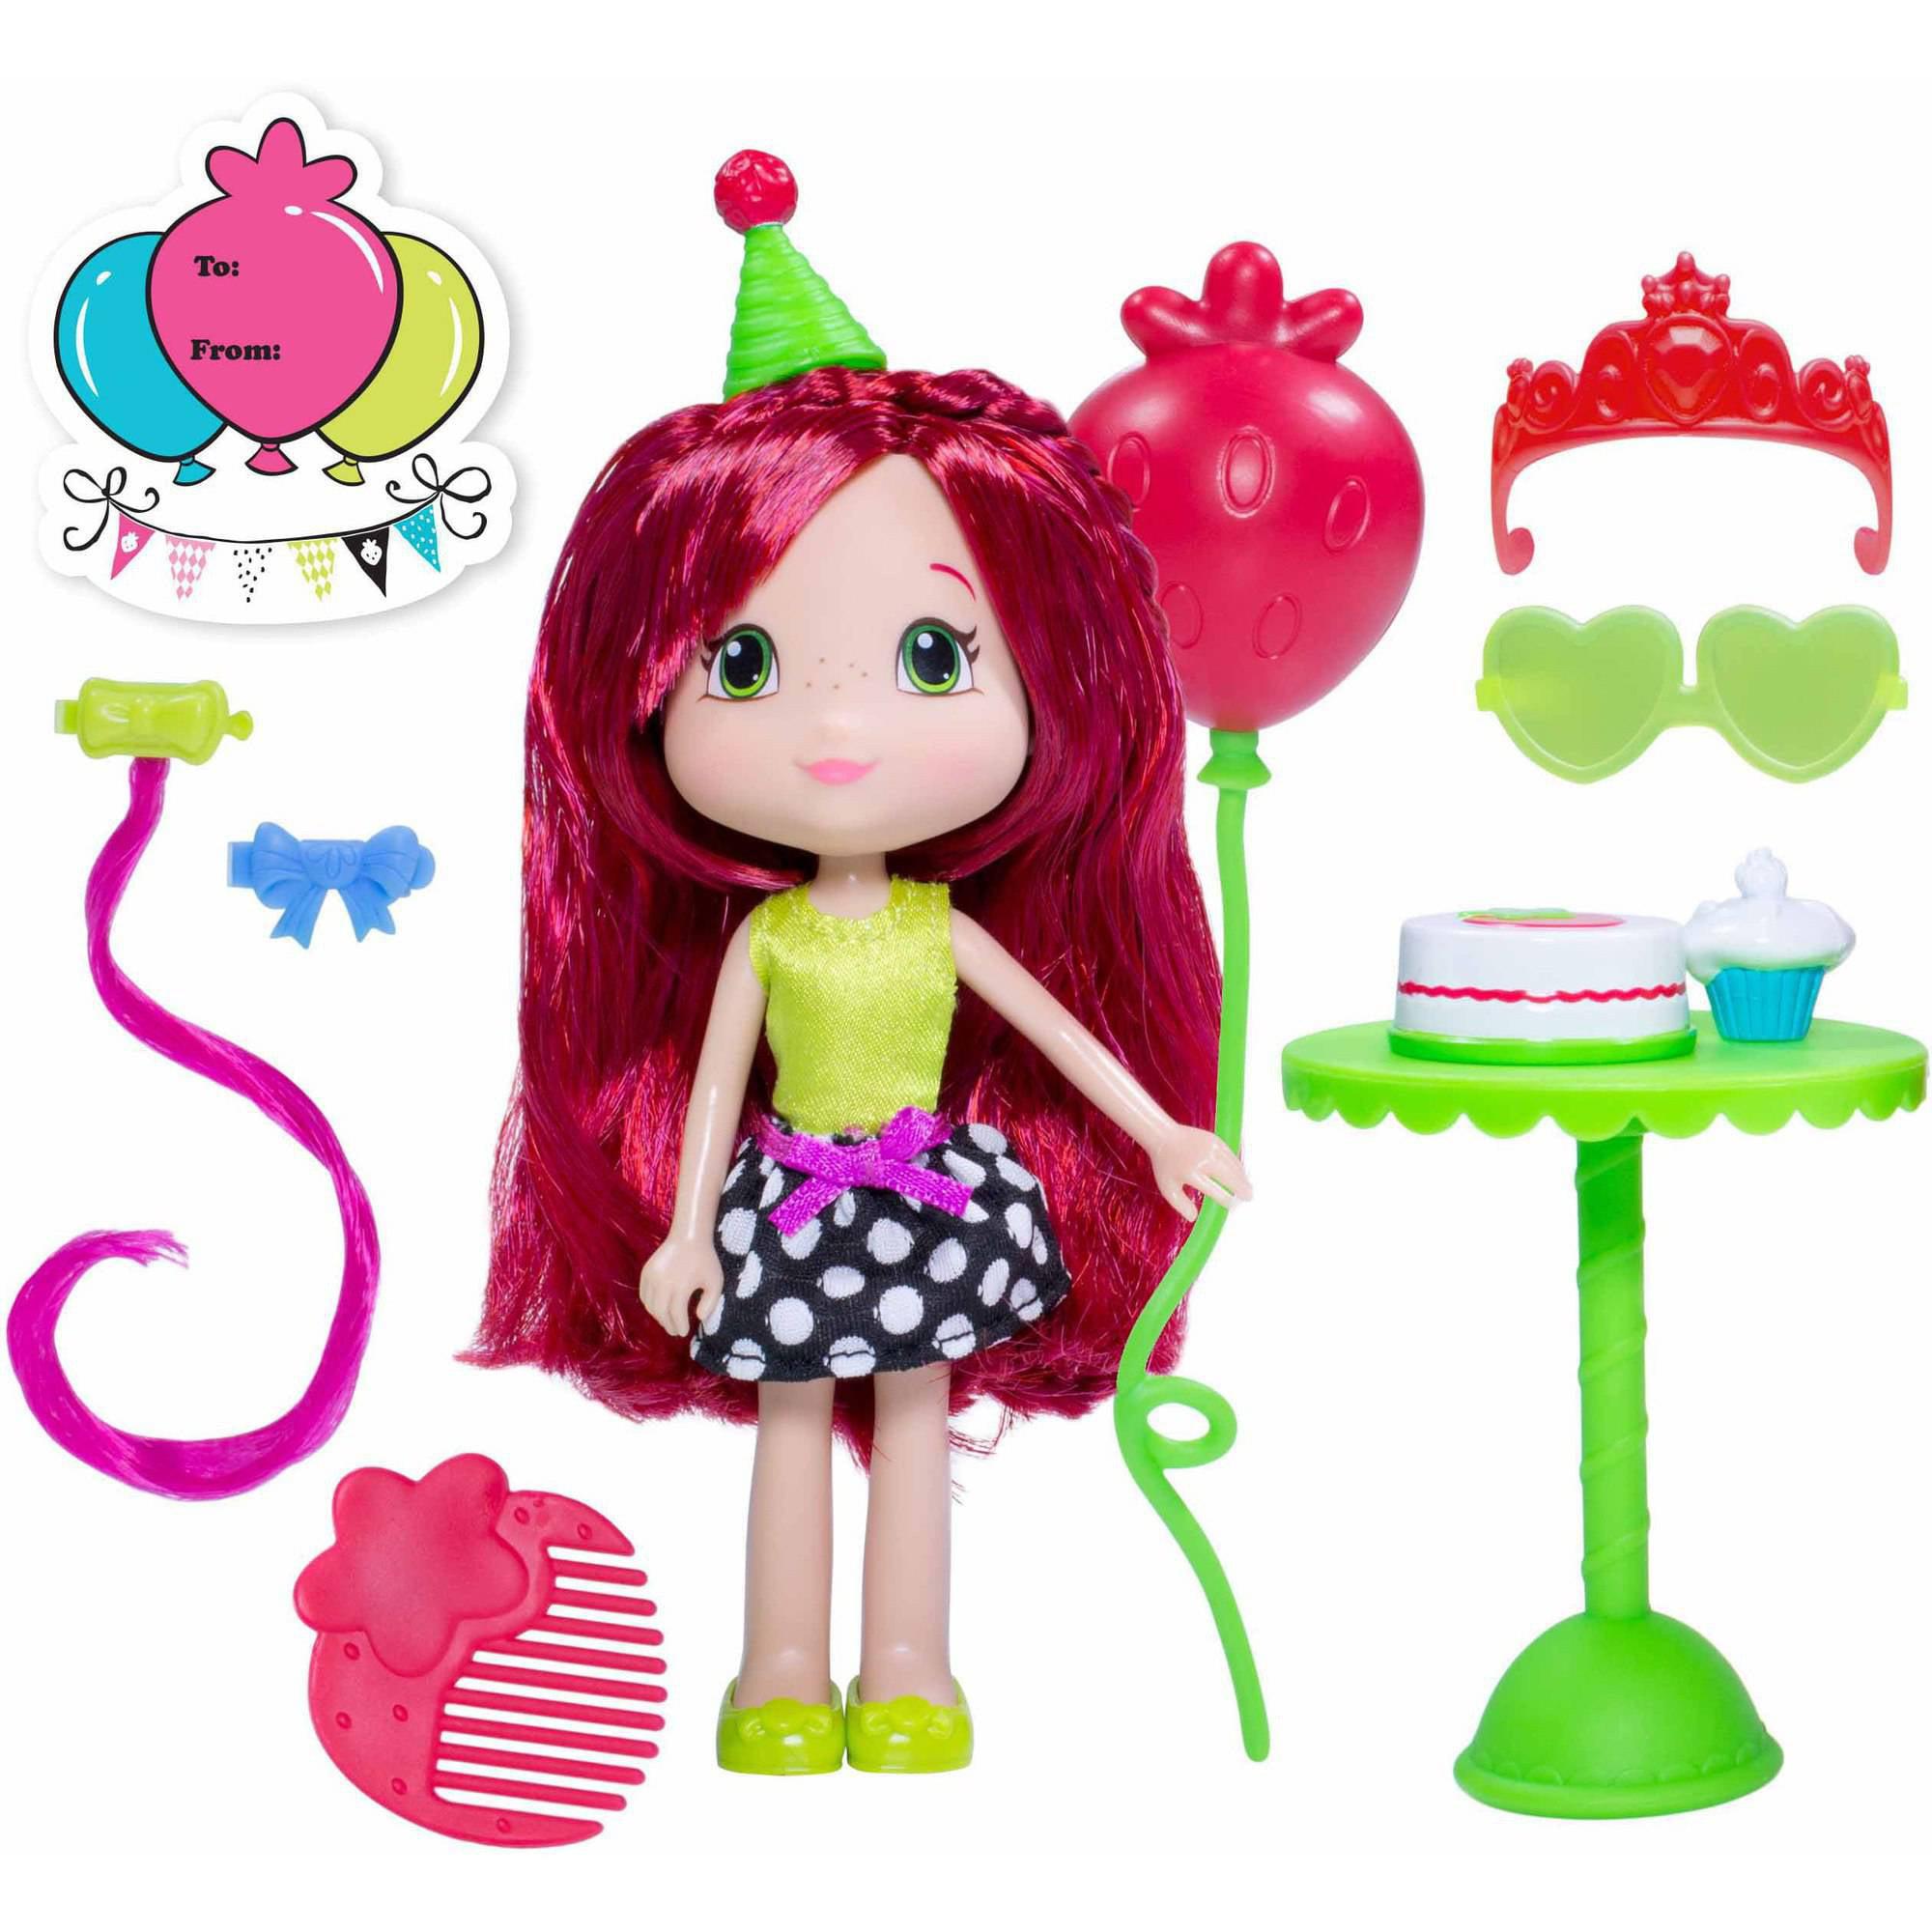 Strawberry Shortcake Surprise Party Doll Strawberry Shortcake